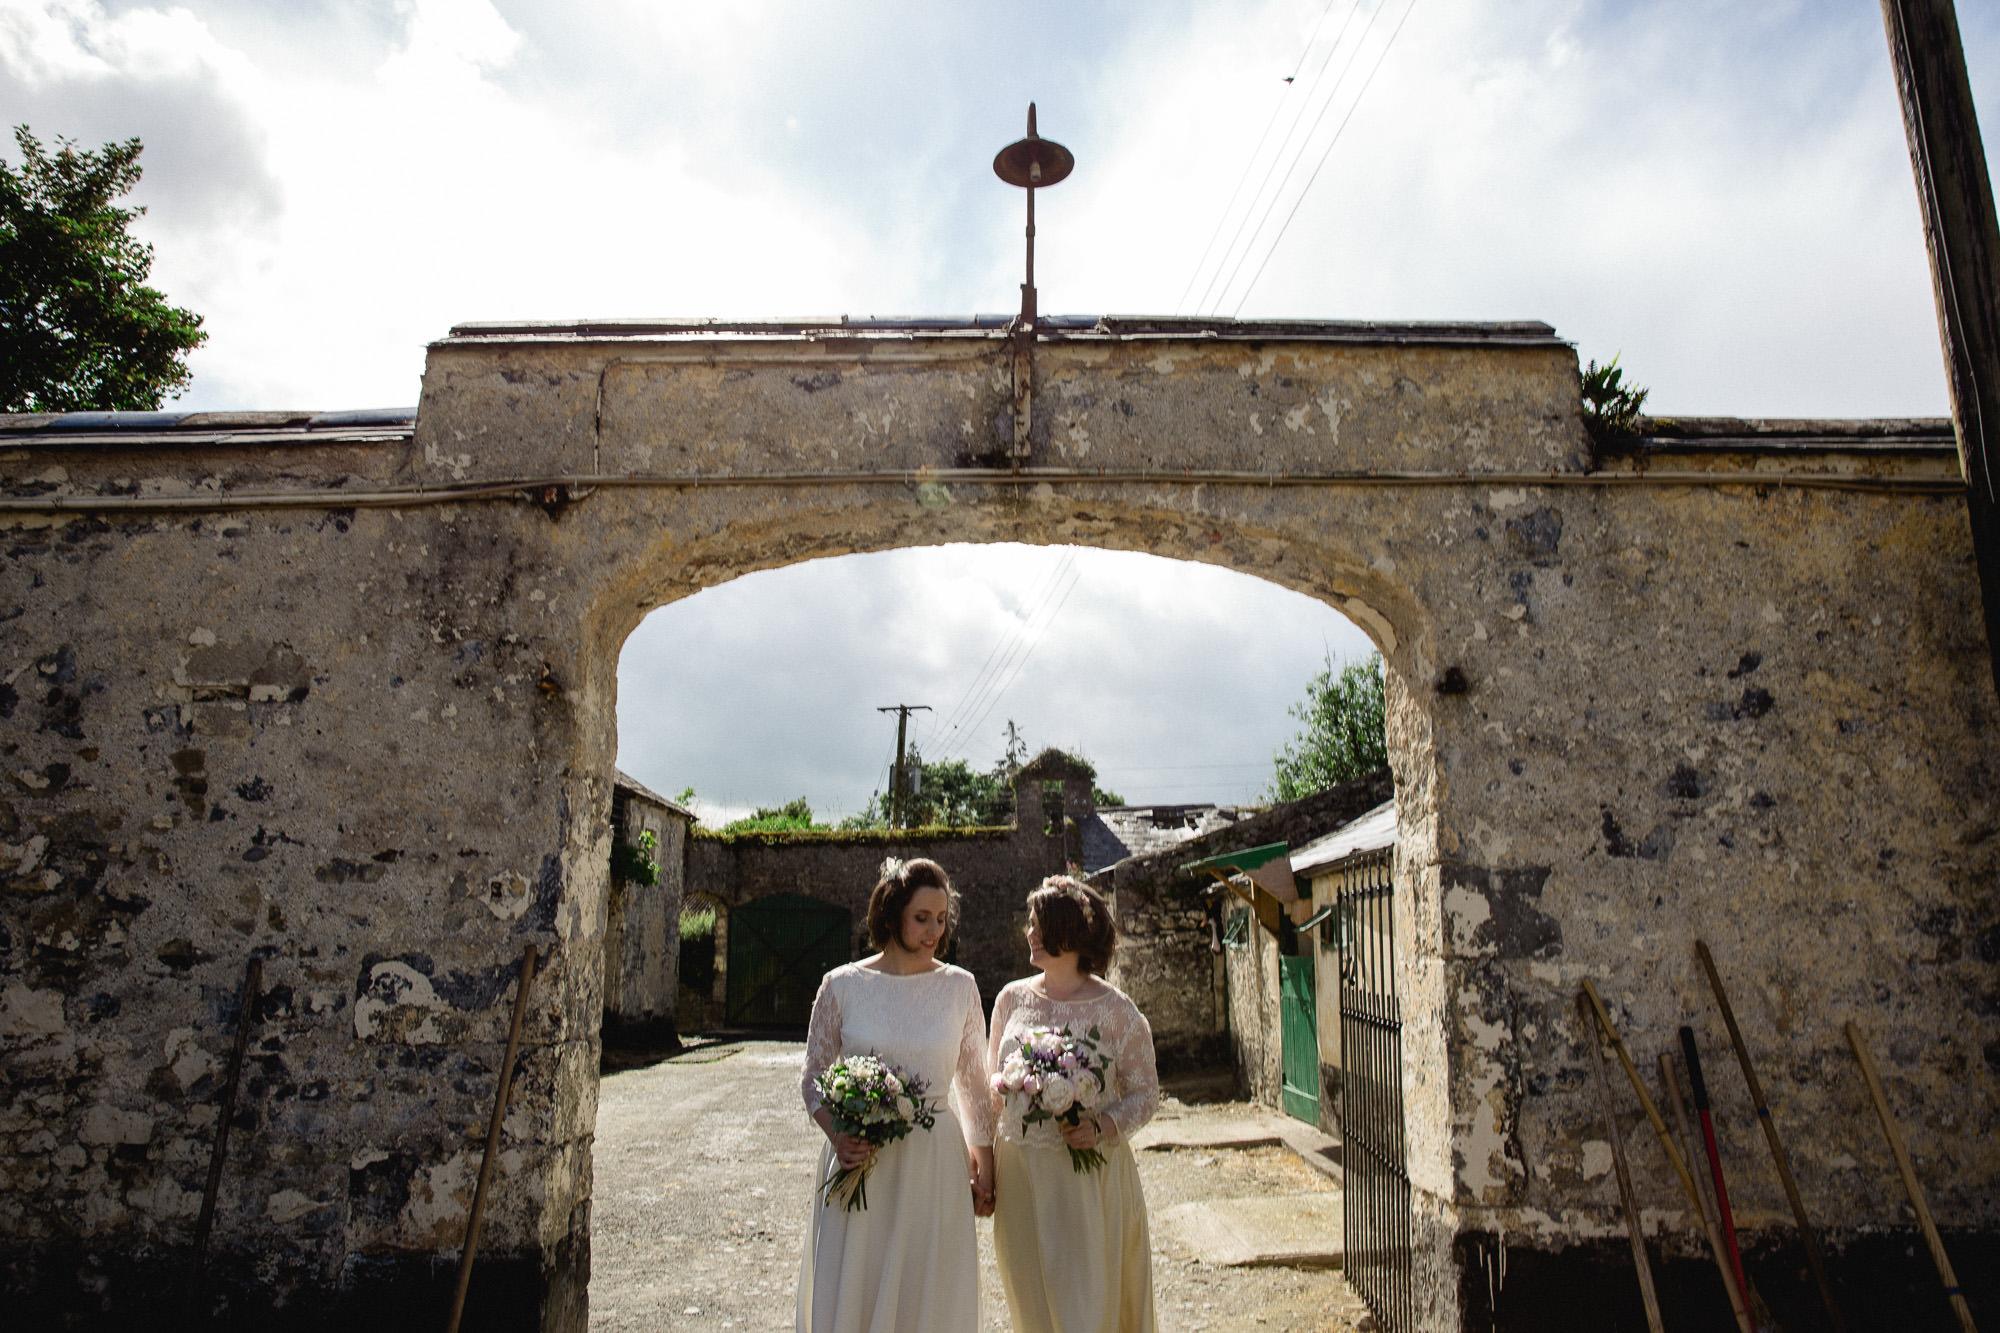 CLAIREBYRNEPHOTOGRAPHY-WEDDING-Ireland-cloncody-alternative-fun-Jen-Helena-10.jpg